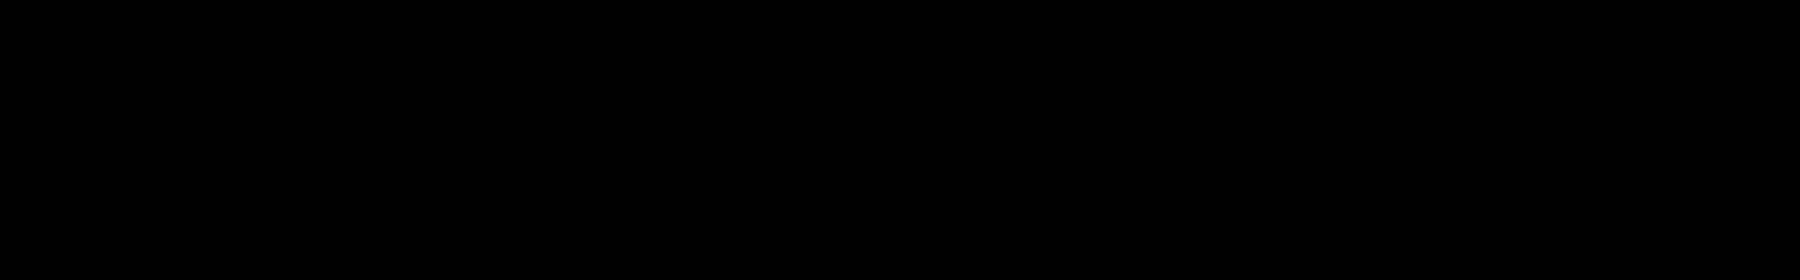 RAZOR'S EDGE Bass edition audio waveform